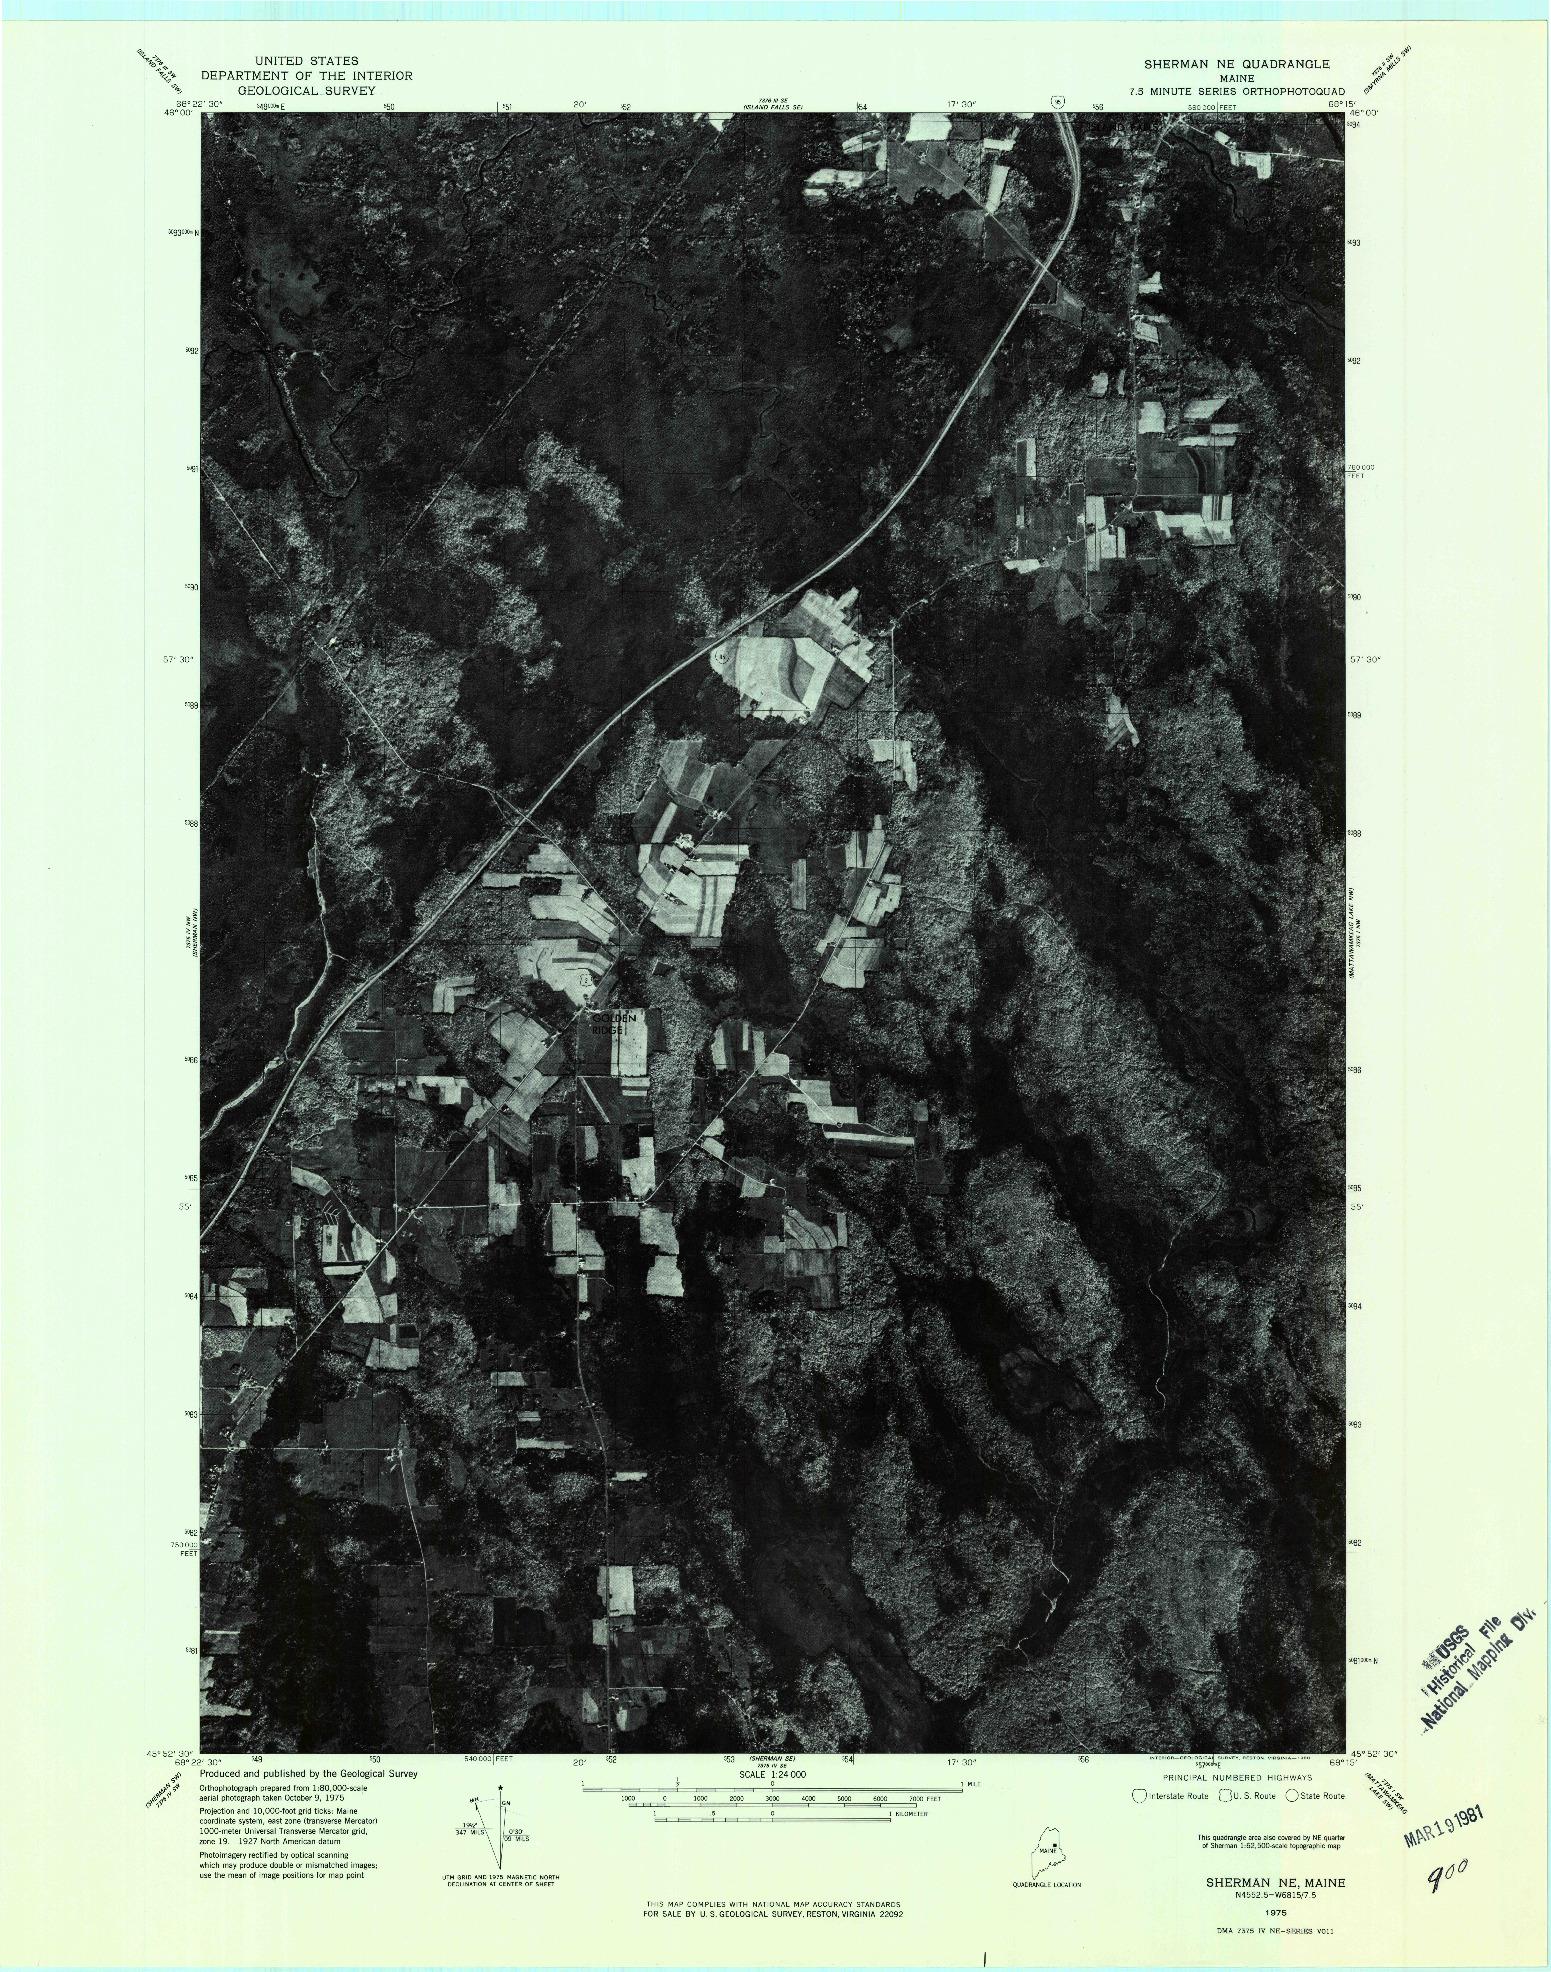 USGS 1:24000-SCALE QUADRANGLE FOR SHERMAN NE, ME 1975